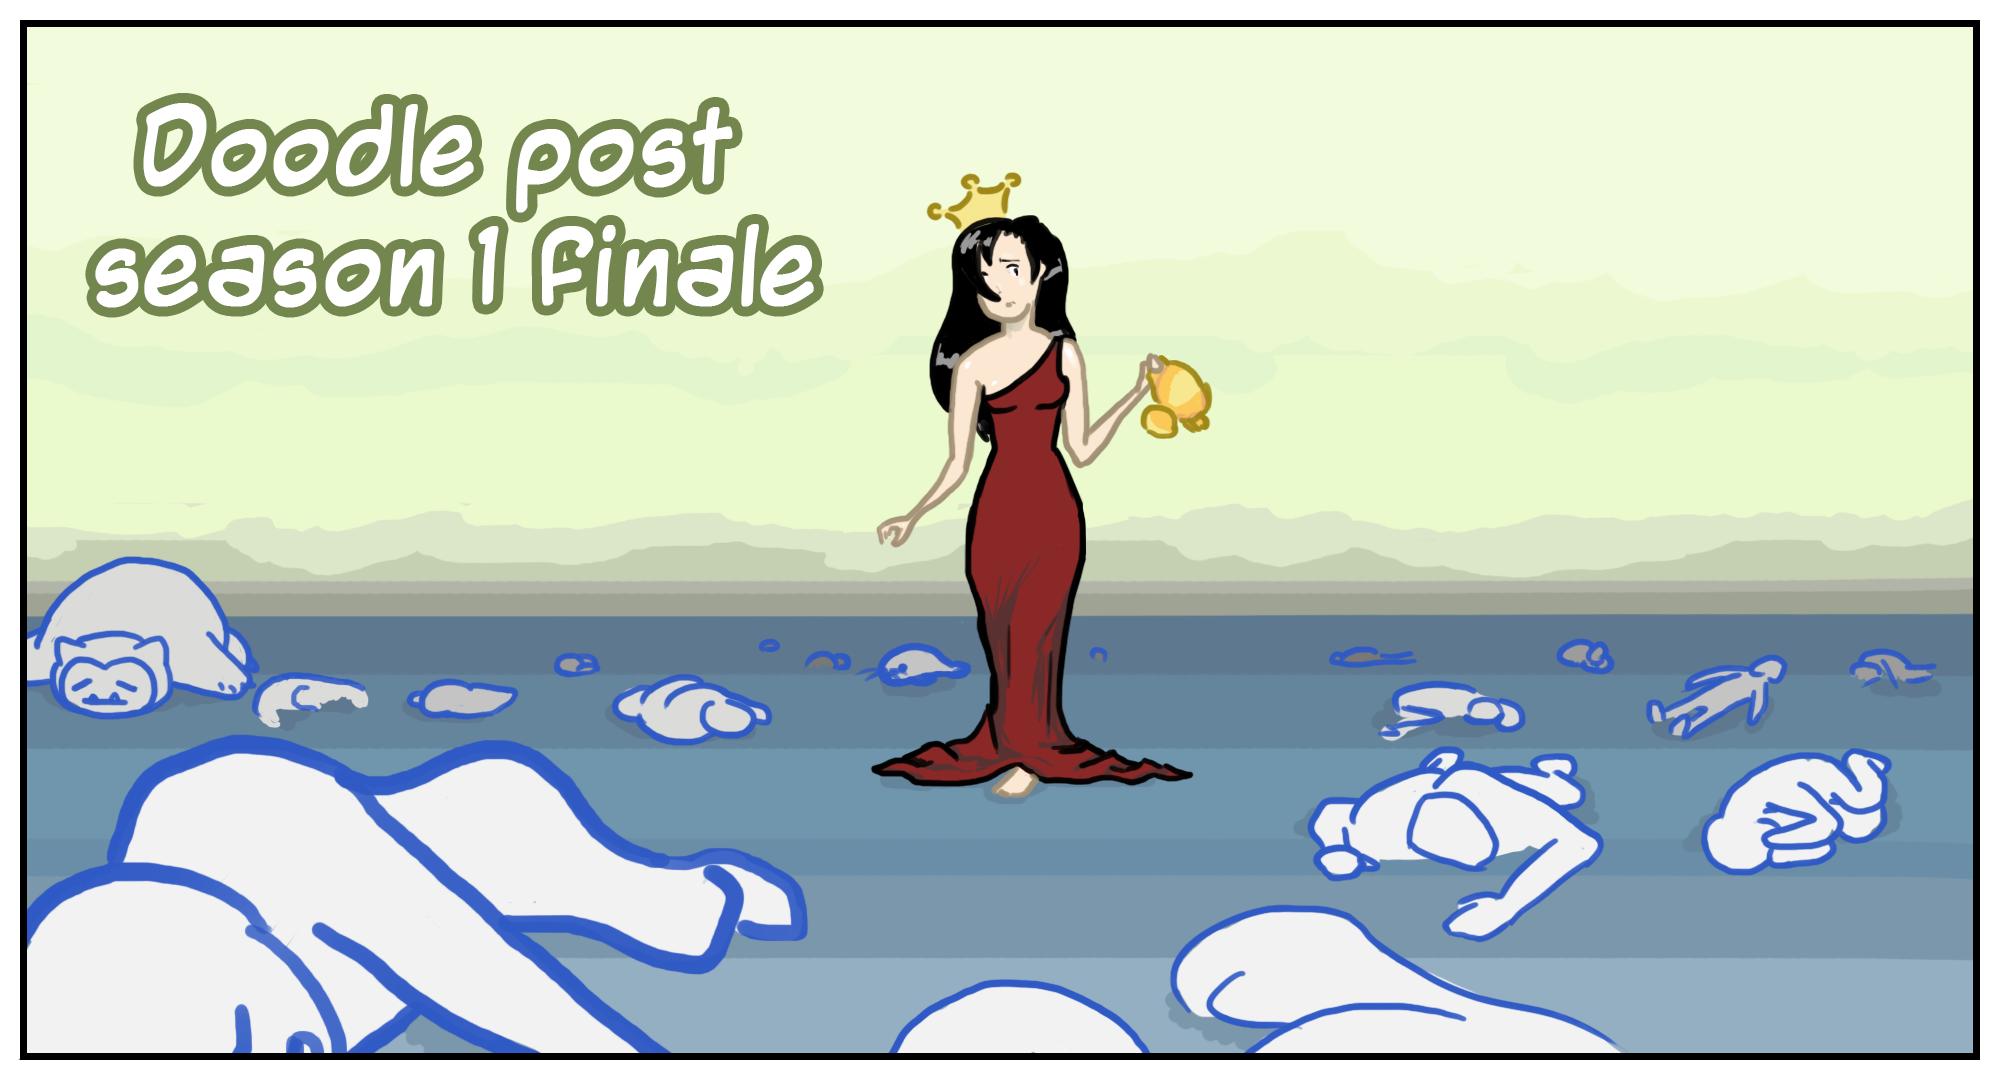 Doodle post season finale +диаграмма - Изображение 1